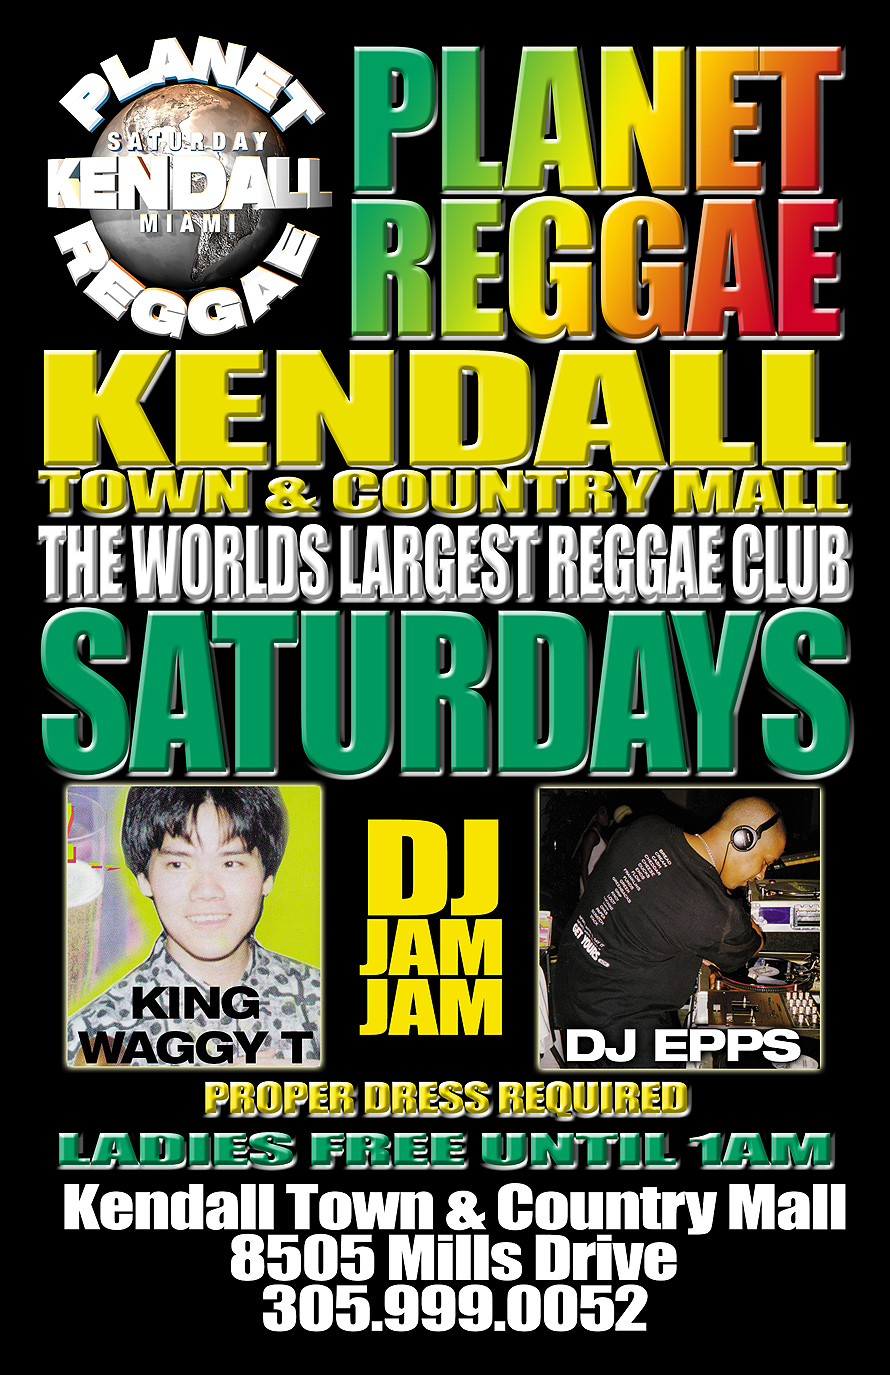 Planet Reggae Saturdays at Rascals in Kendall